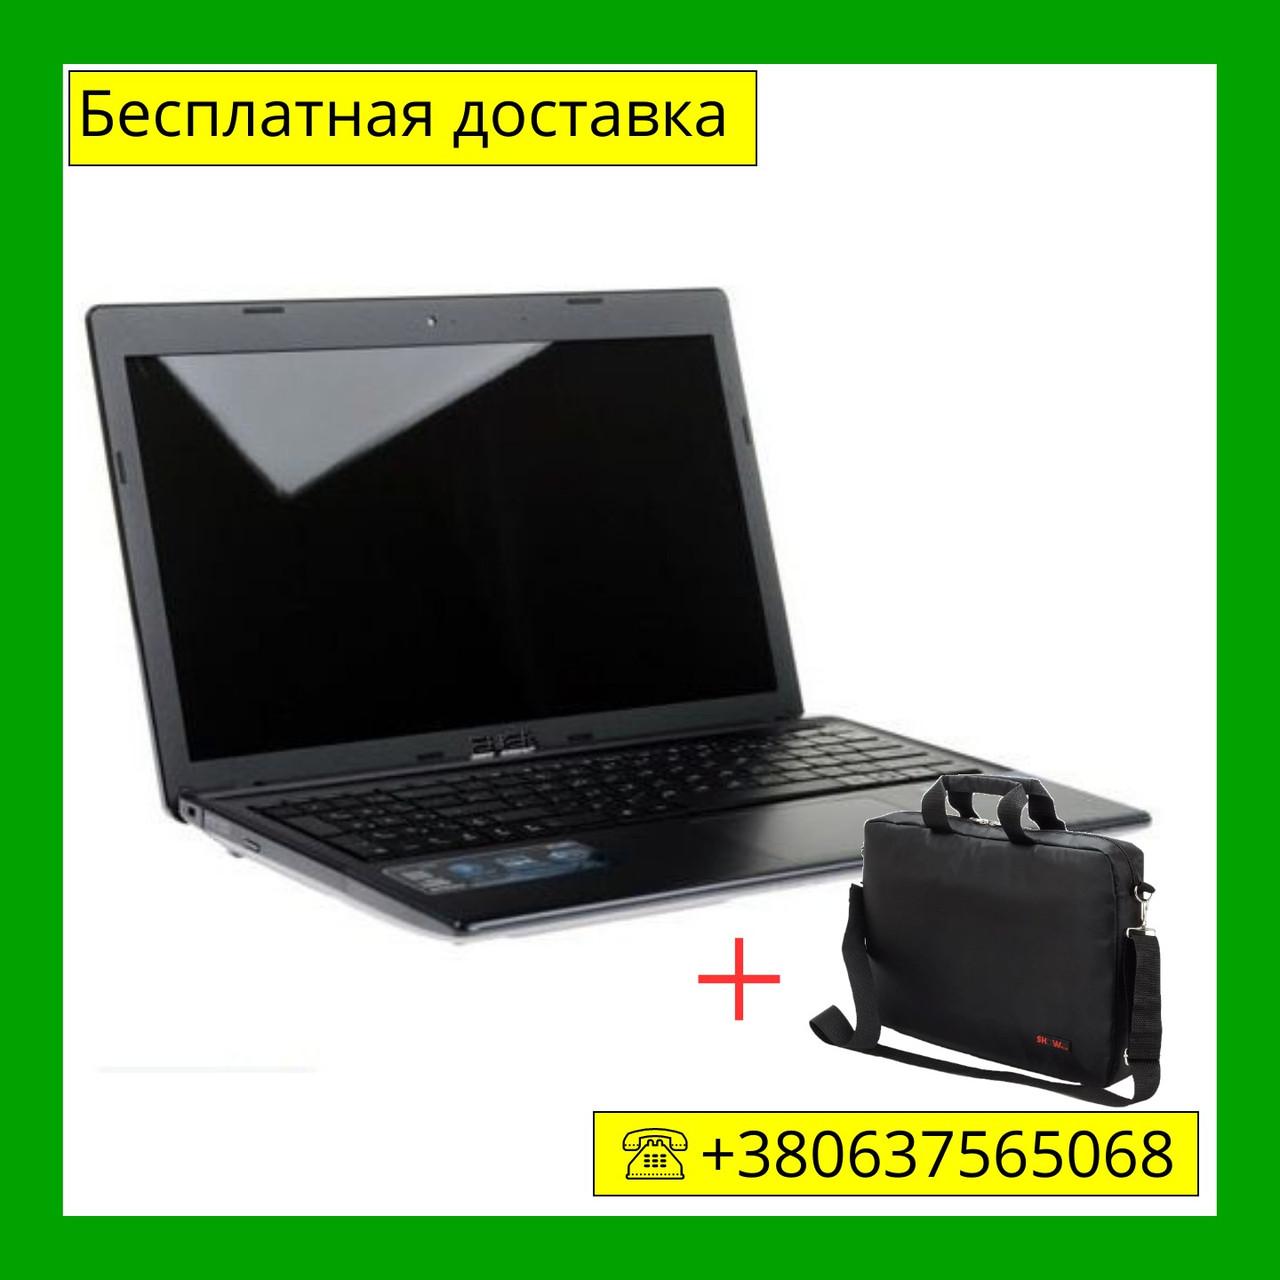 Б/У ноутбук Asus X55V  15,6 \ i3-2338M \ 4 GB \ 500 GB \ GeForce 610M \, фото 1